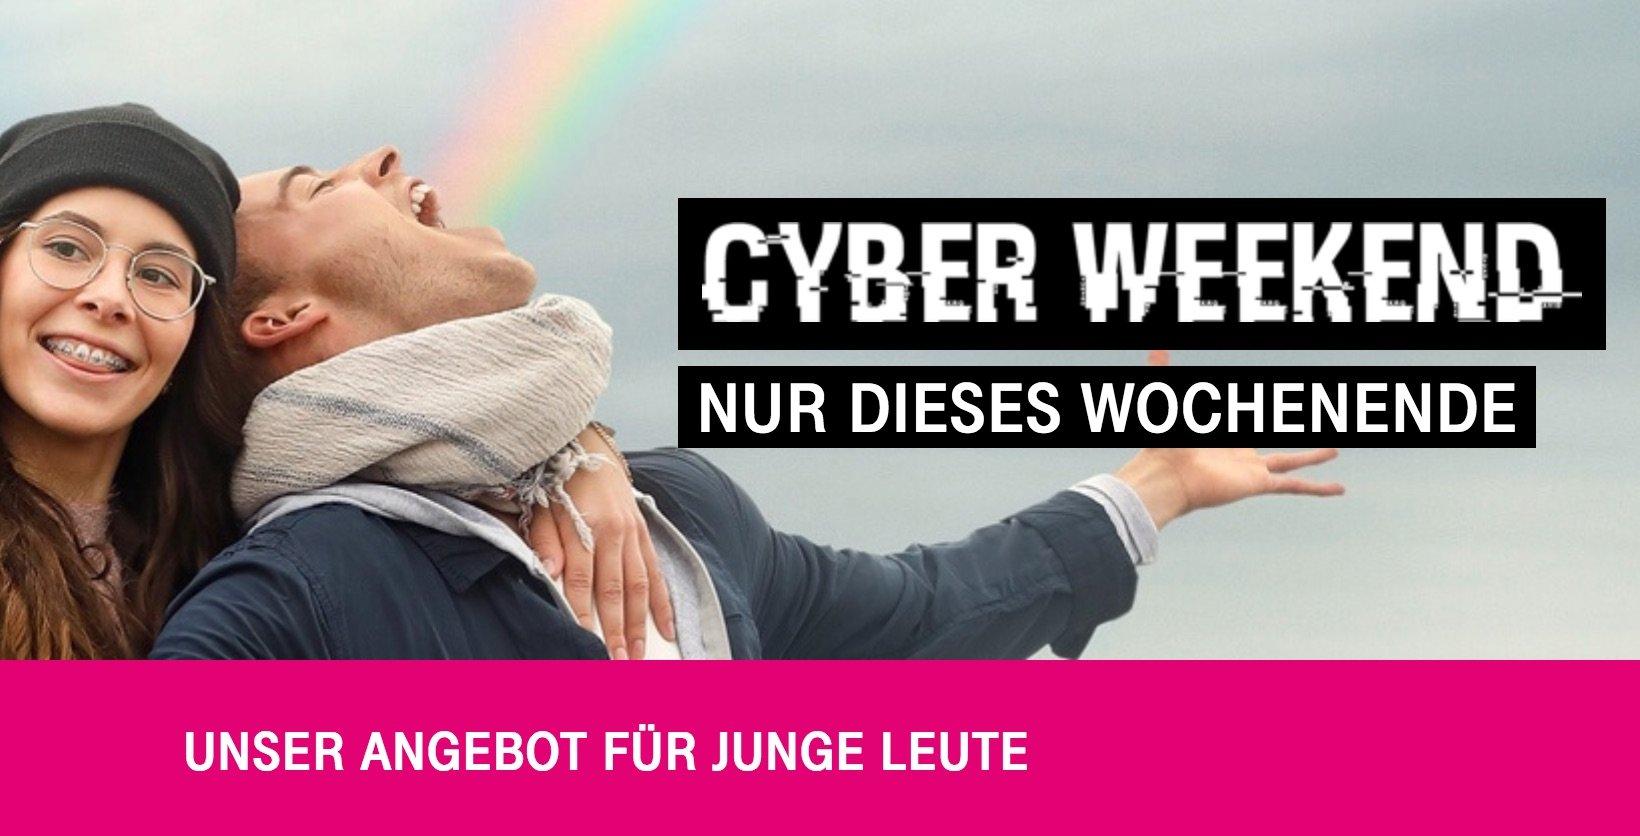 Telekom Aktion: 240 Euro sparen beim Cyber Weekend Deal 2